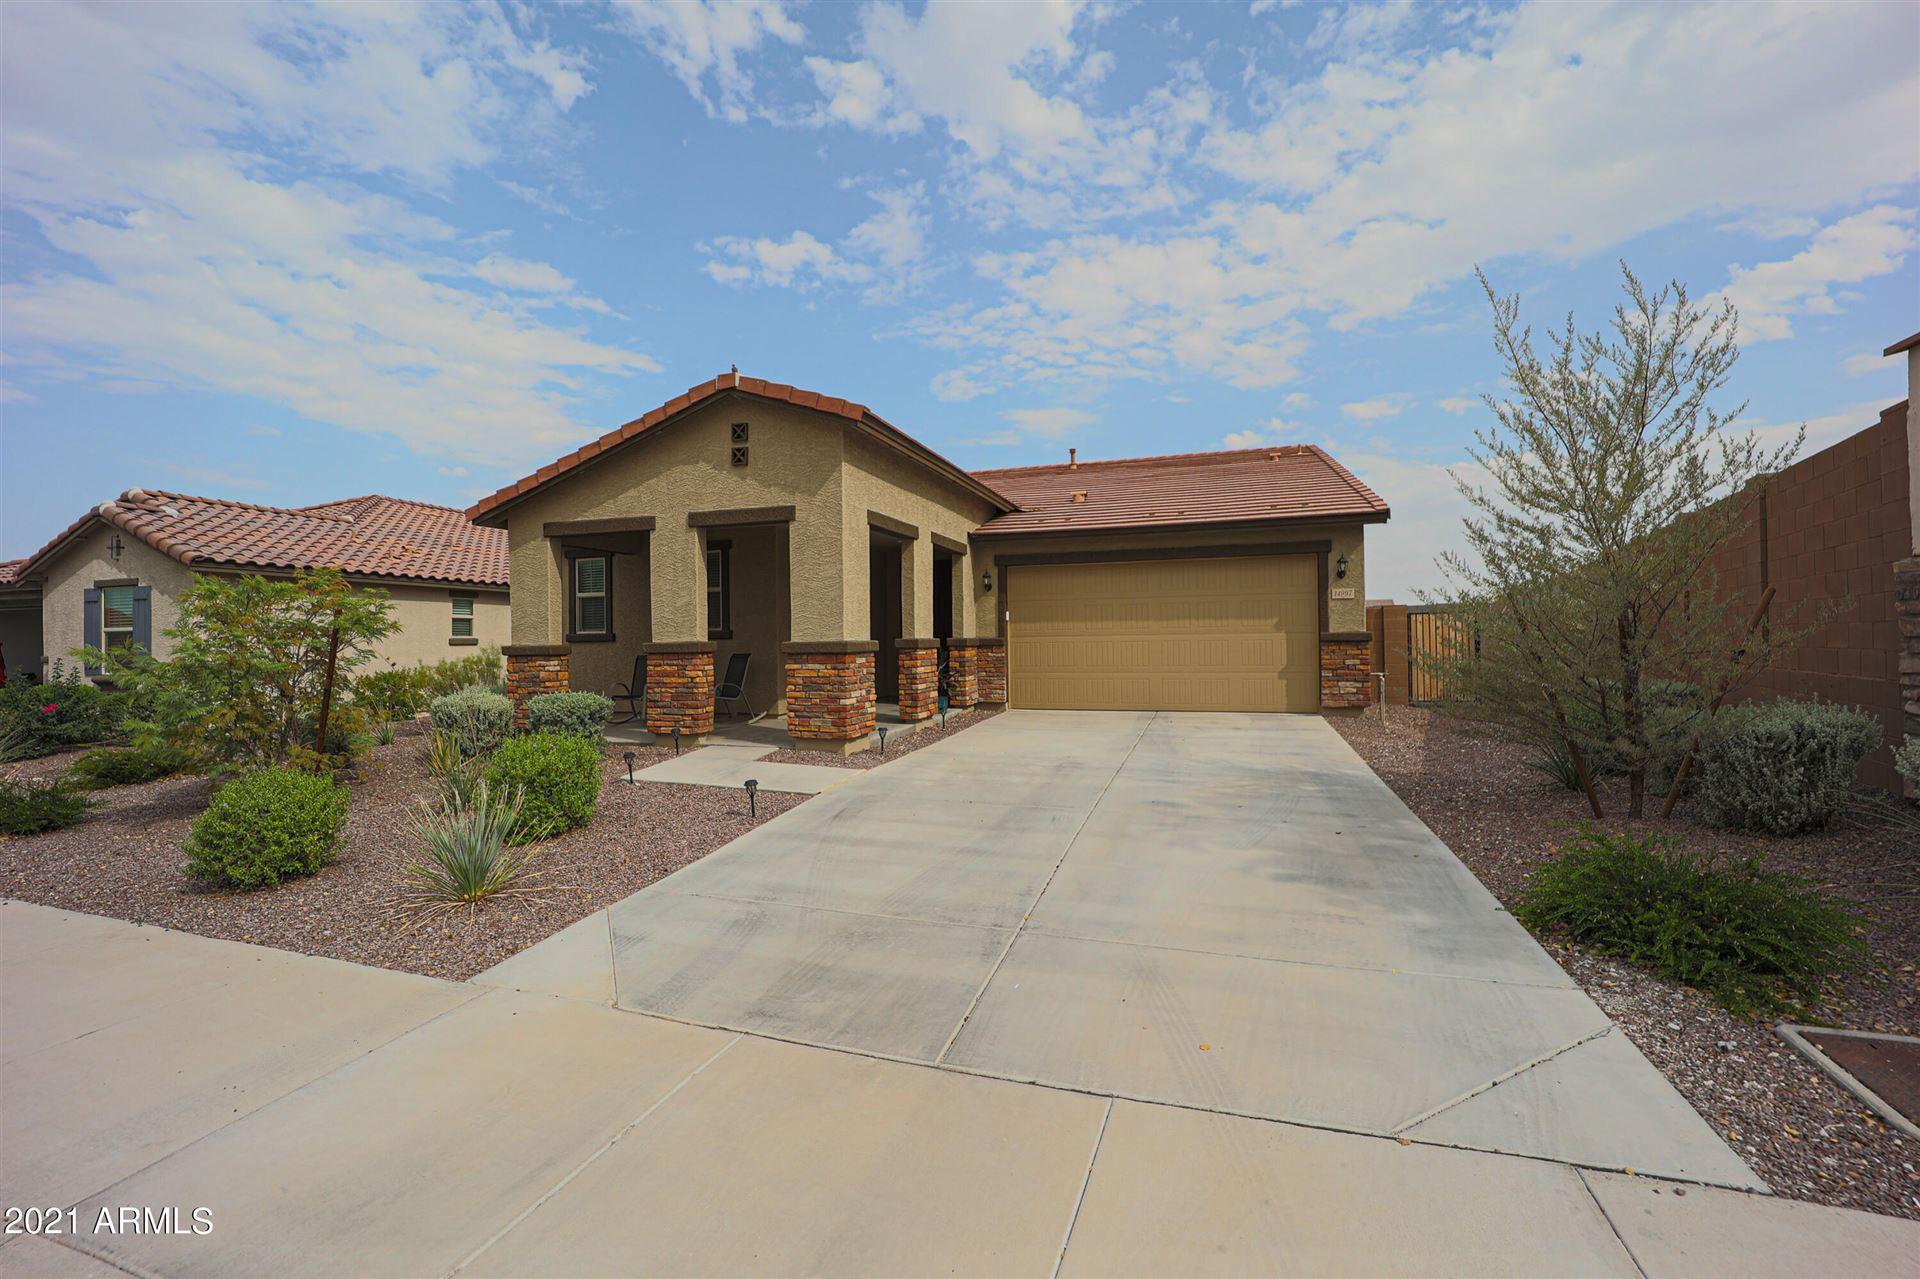 Photo of 14997 S 181ST Lane, Goodyear, AZ 85338 (MLS # 6296292)